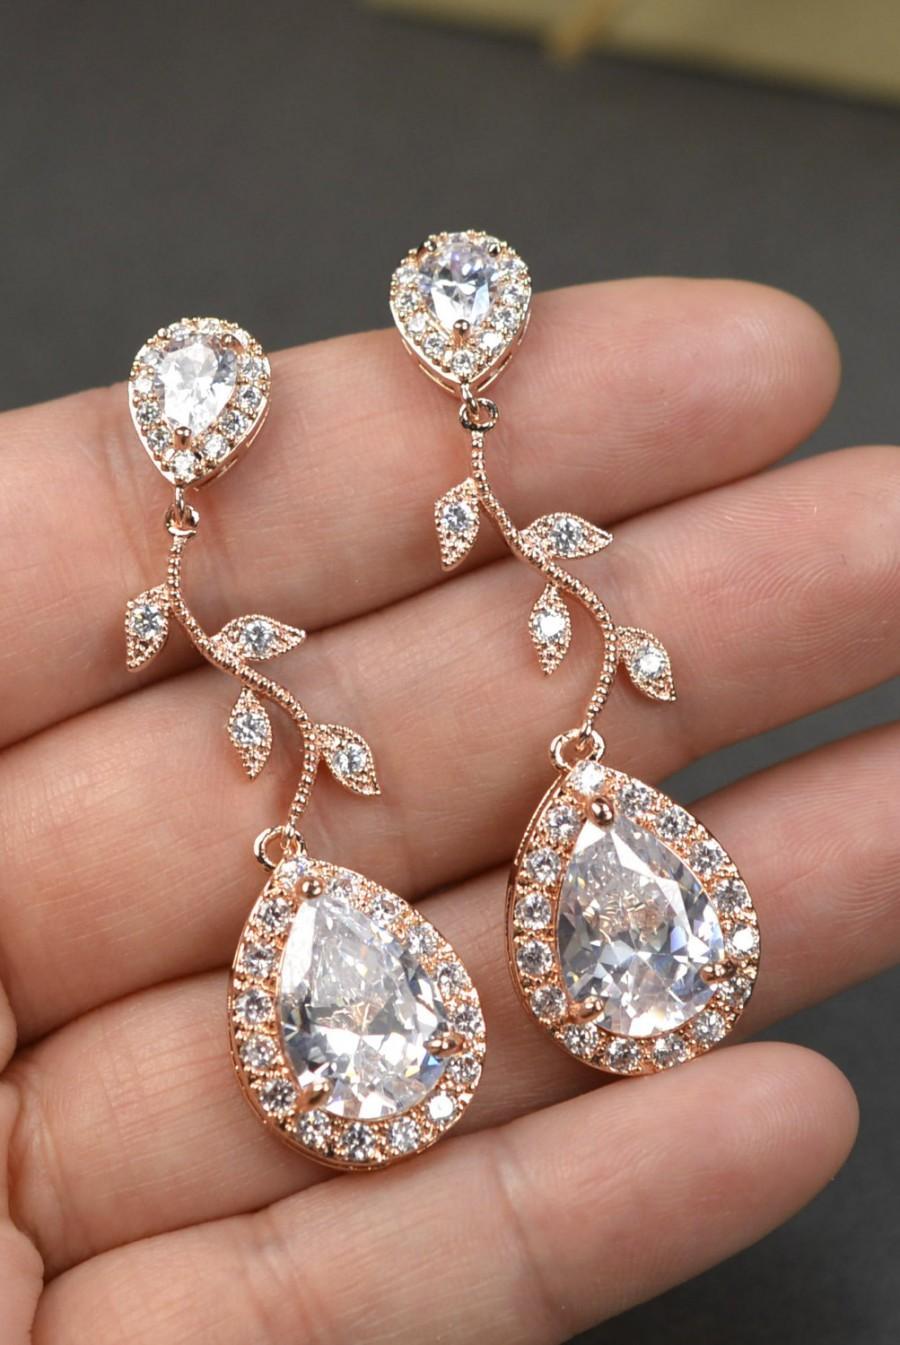 Rose Gold Crystal Bridal Earrings Wedding Jewelry Set Wedding Bridal Jewelry Chandelier Dangle ...